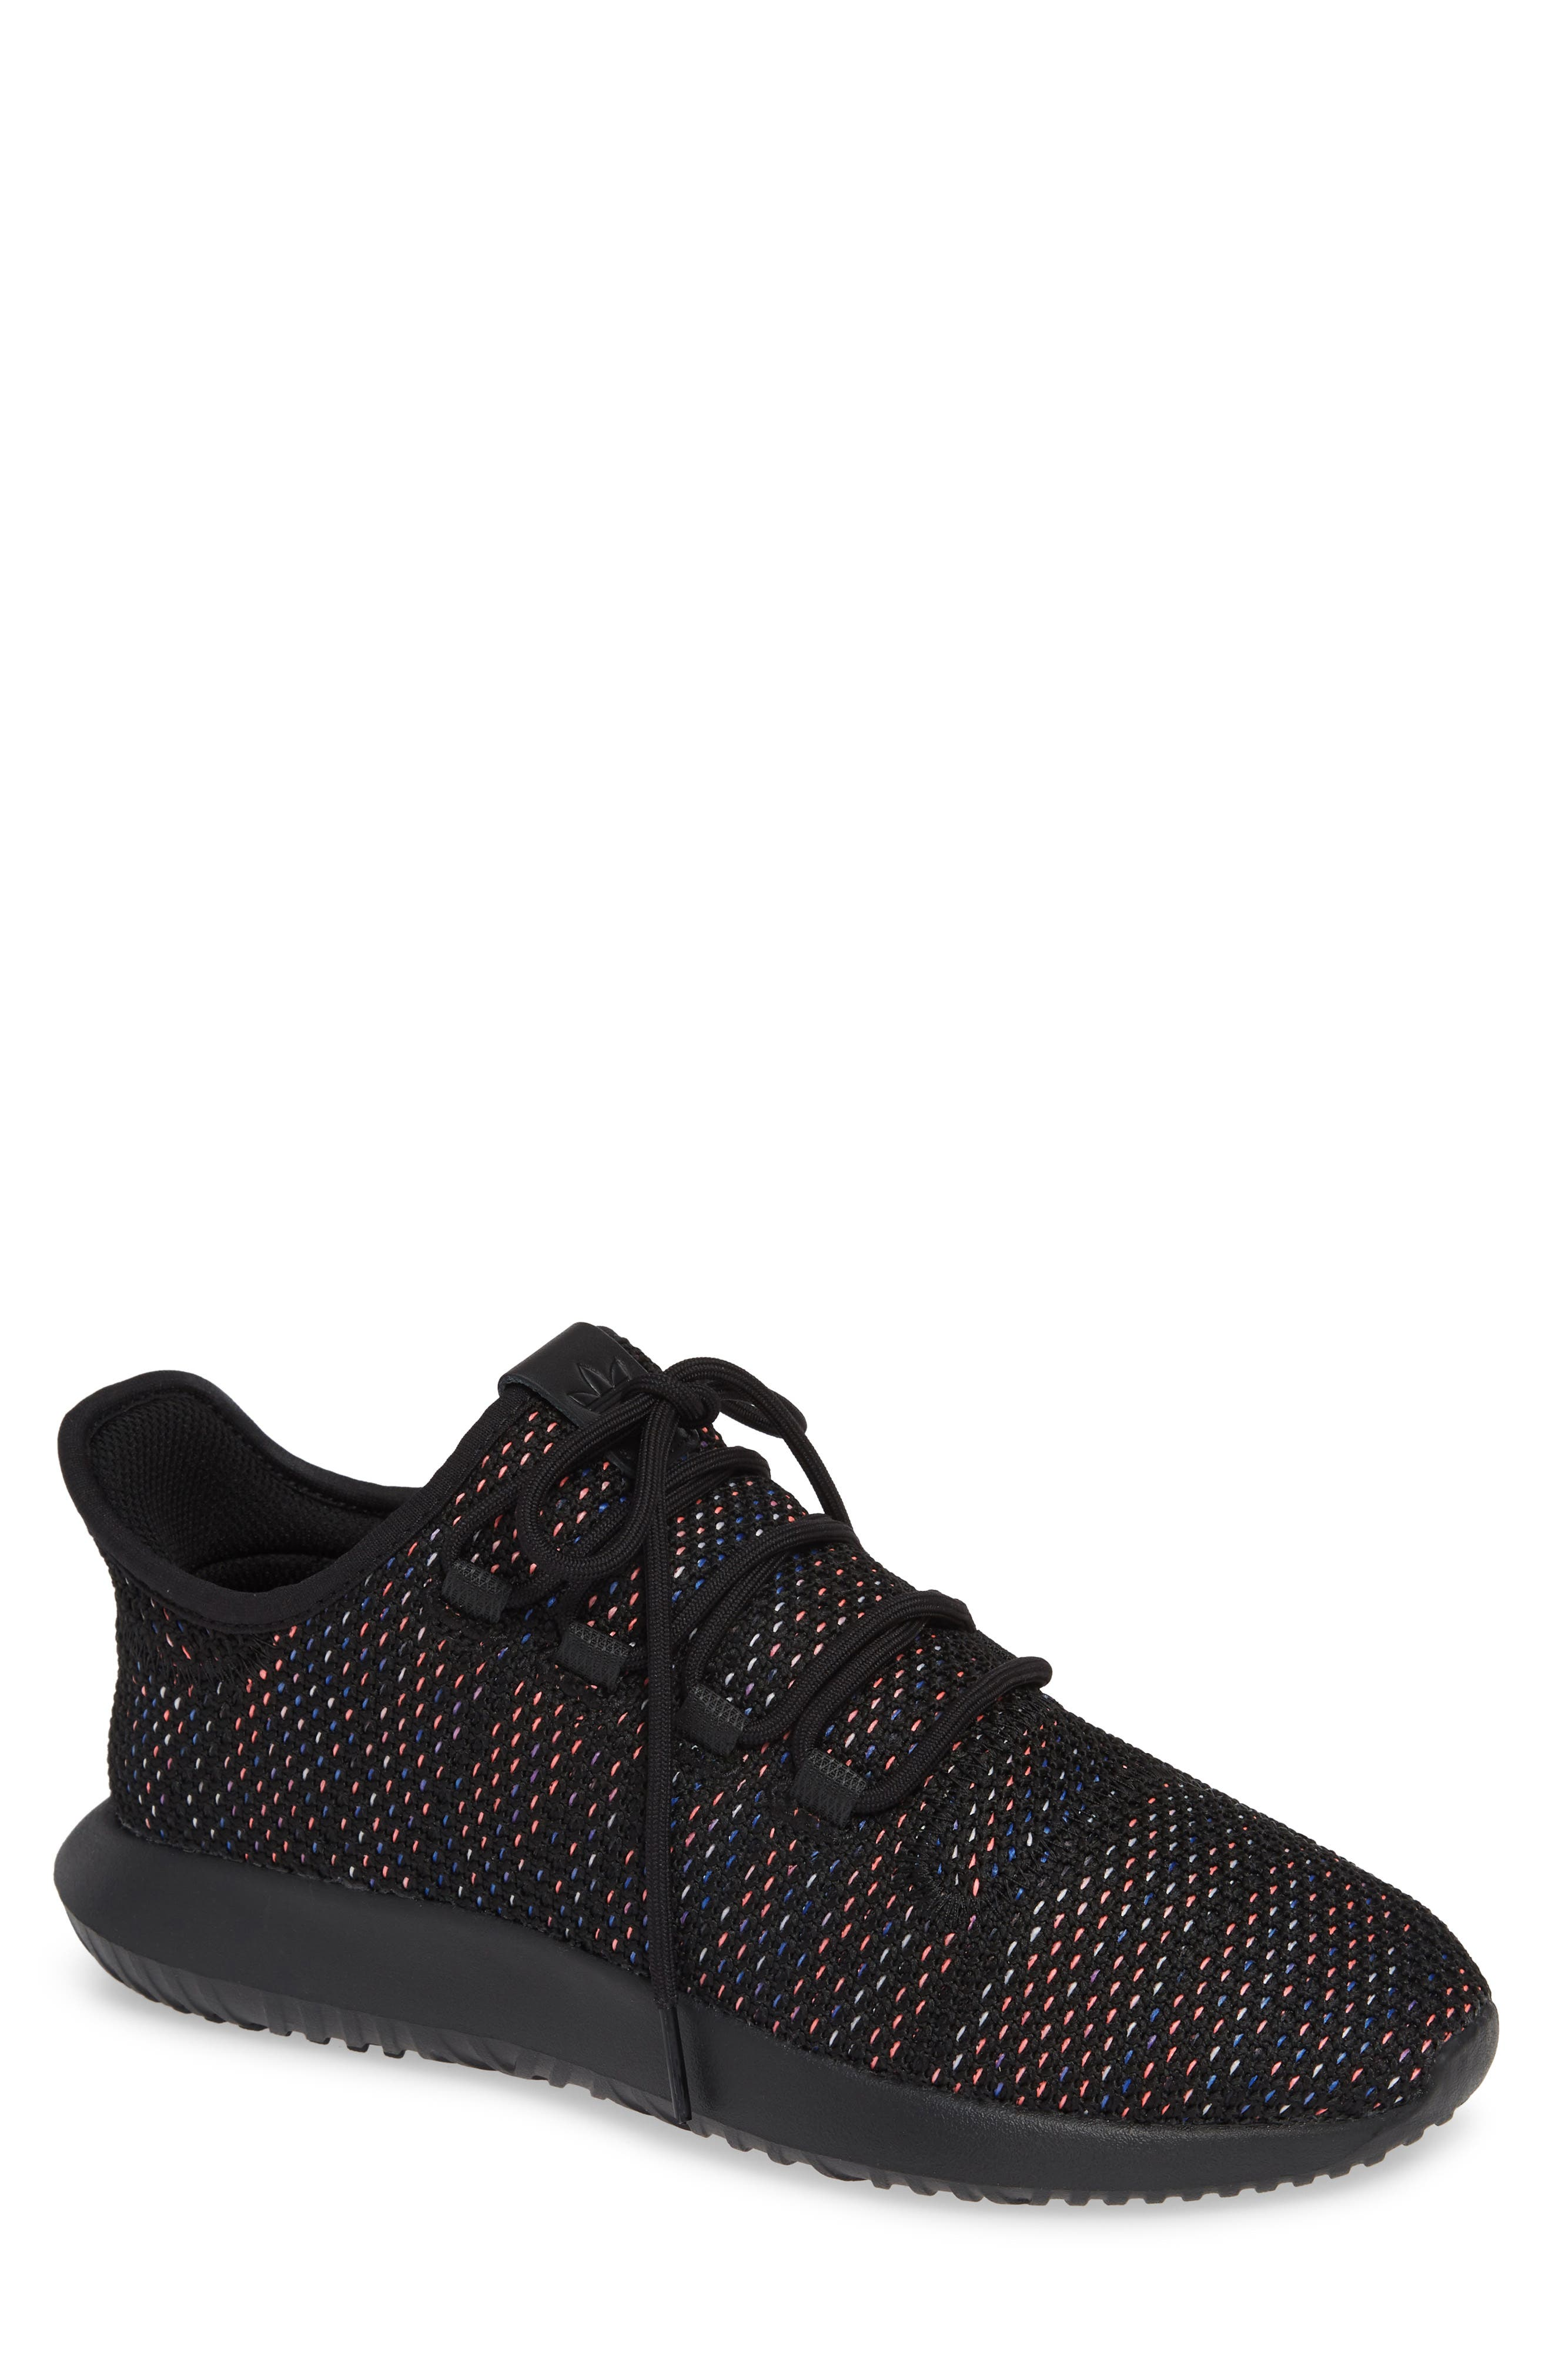 Tubular Shadow CK Sneaker,                             Main thumbnail 1, color,                             BLACK/ SOLAR RED/ MYSTERY INK